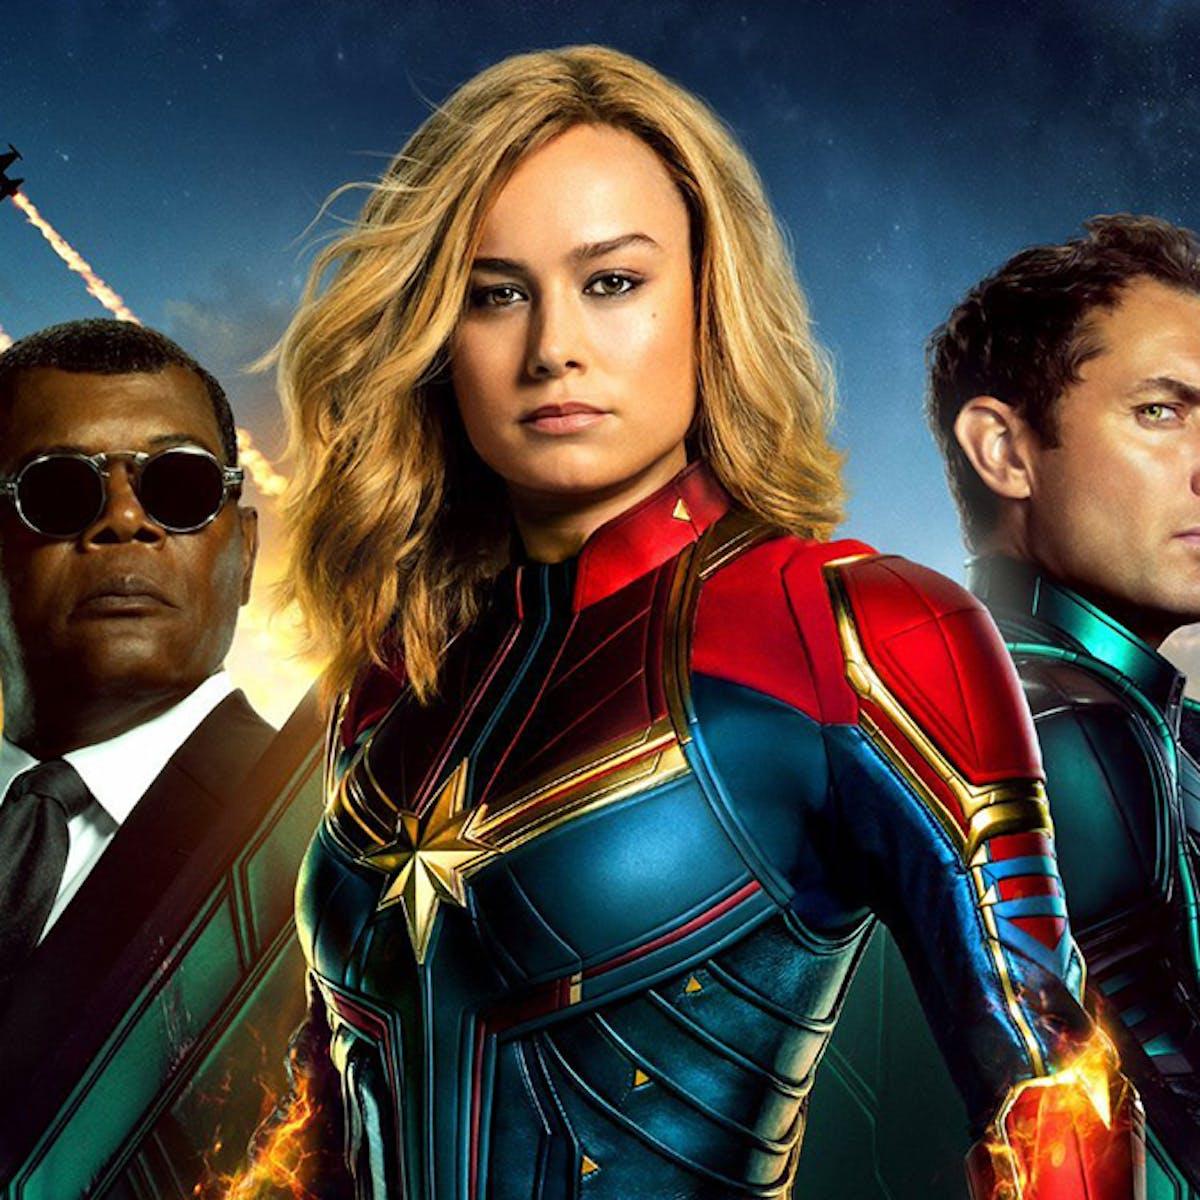 captain marvel' spoilers: how the biggest twist rewrites mcu history